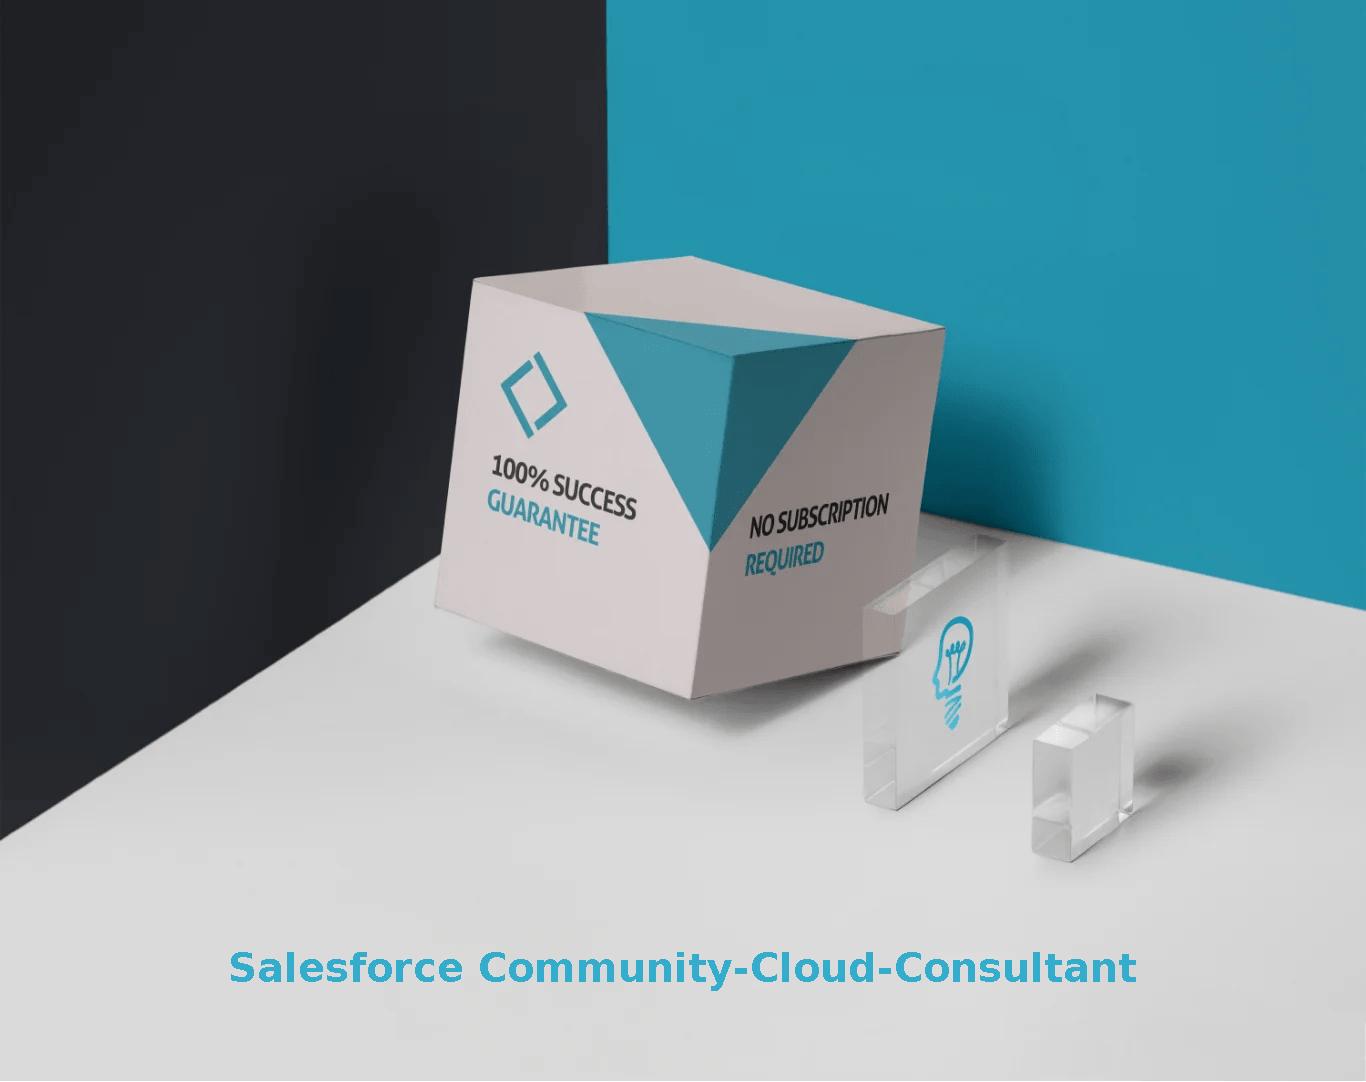 Salesforce Community-Cloud-Consultant Exams